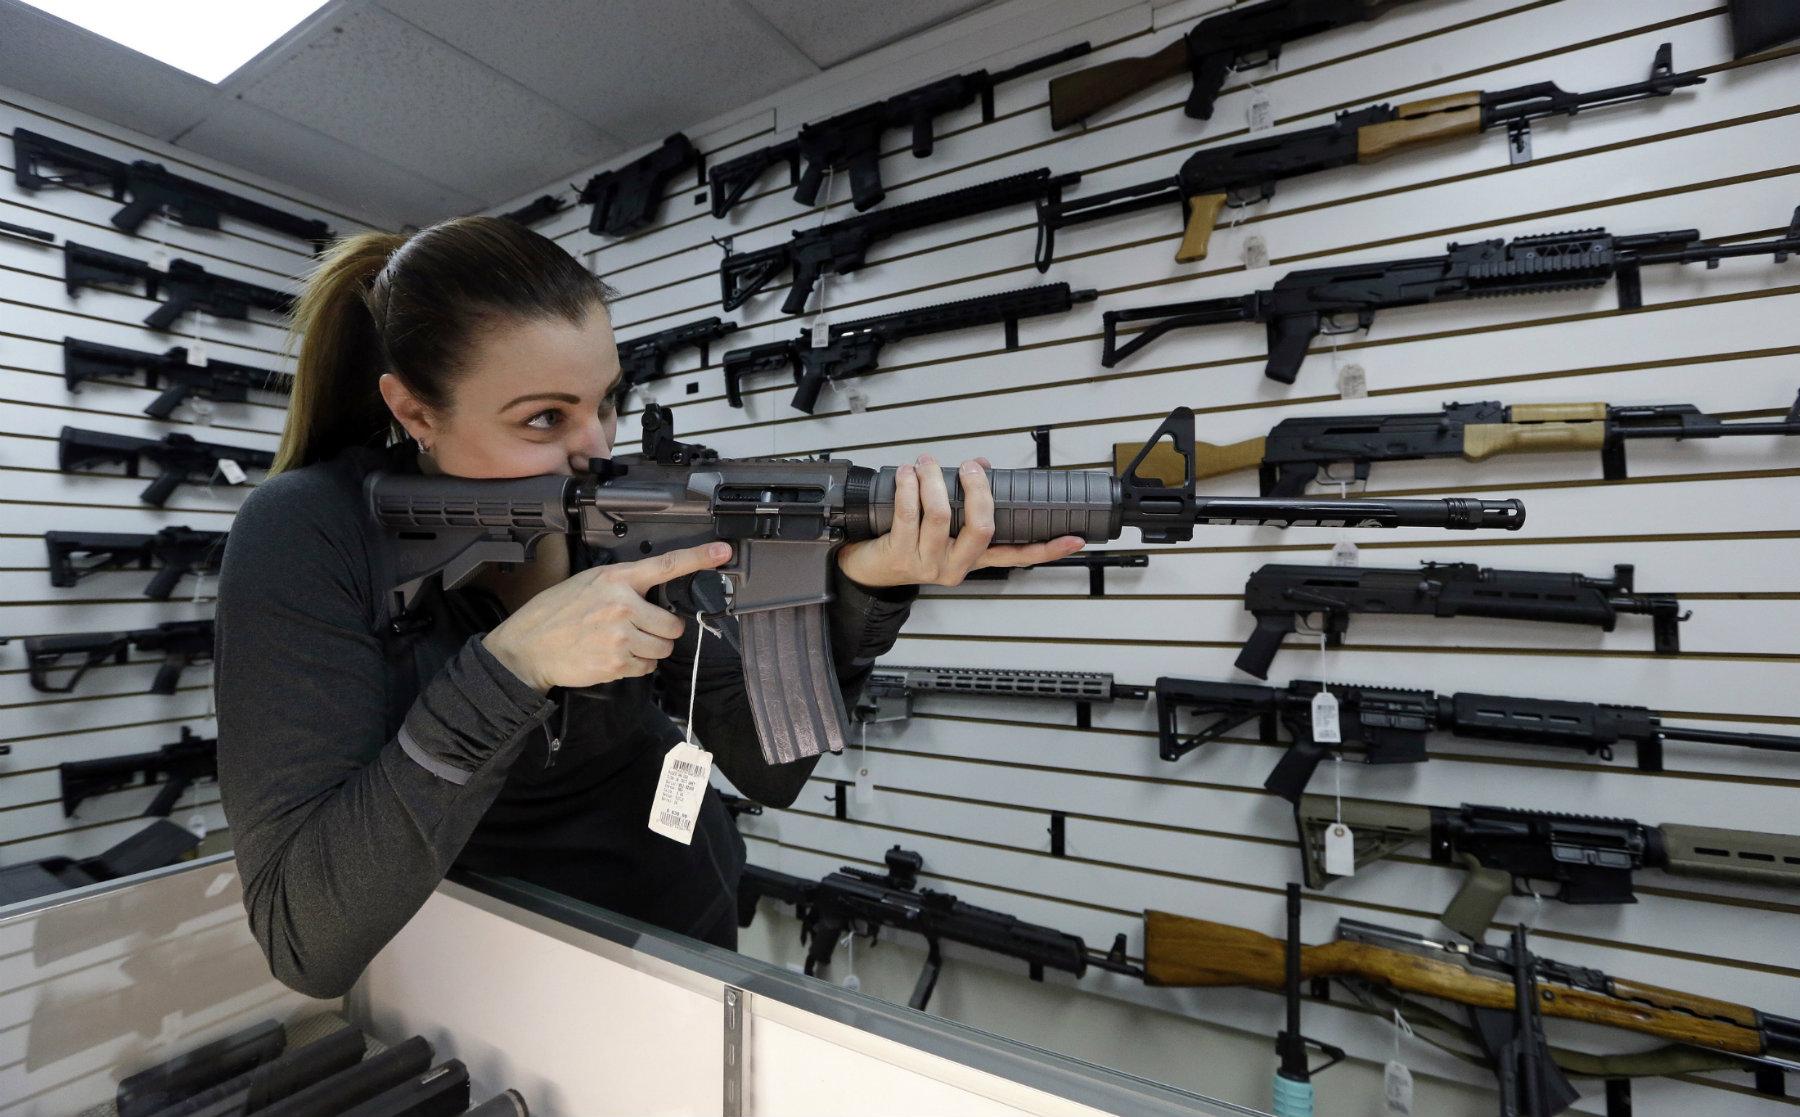 All of PolitiFact California's fact checks on gun violence